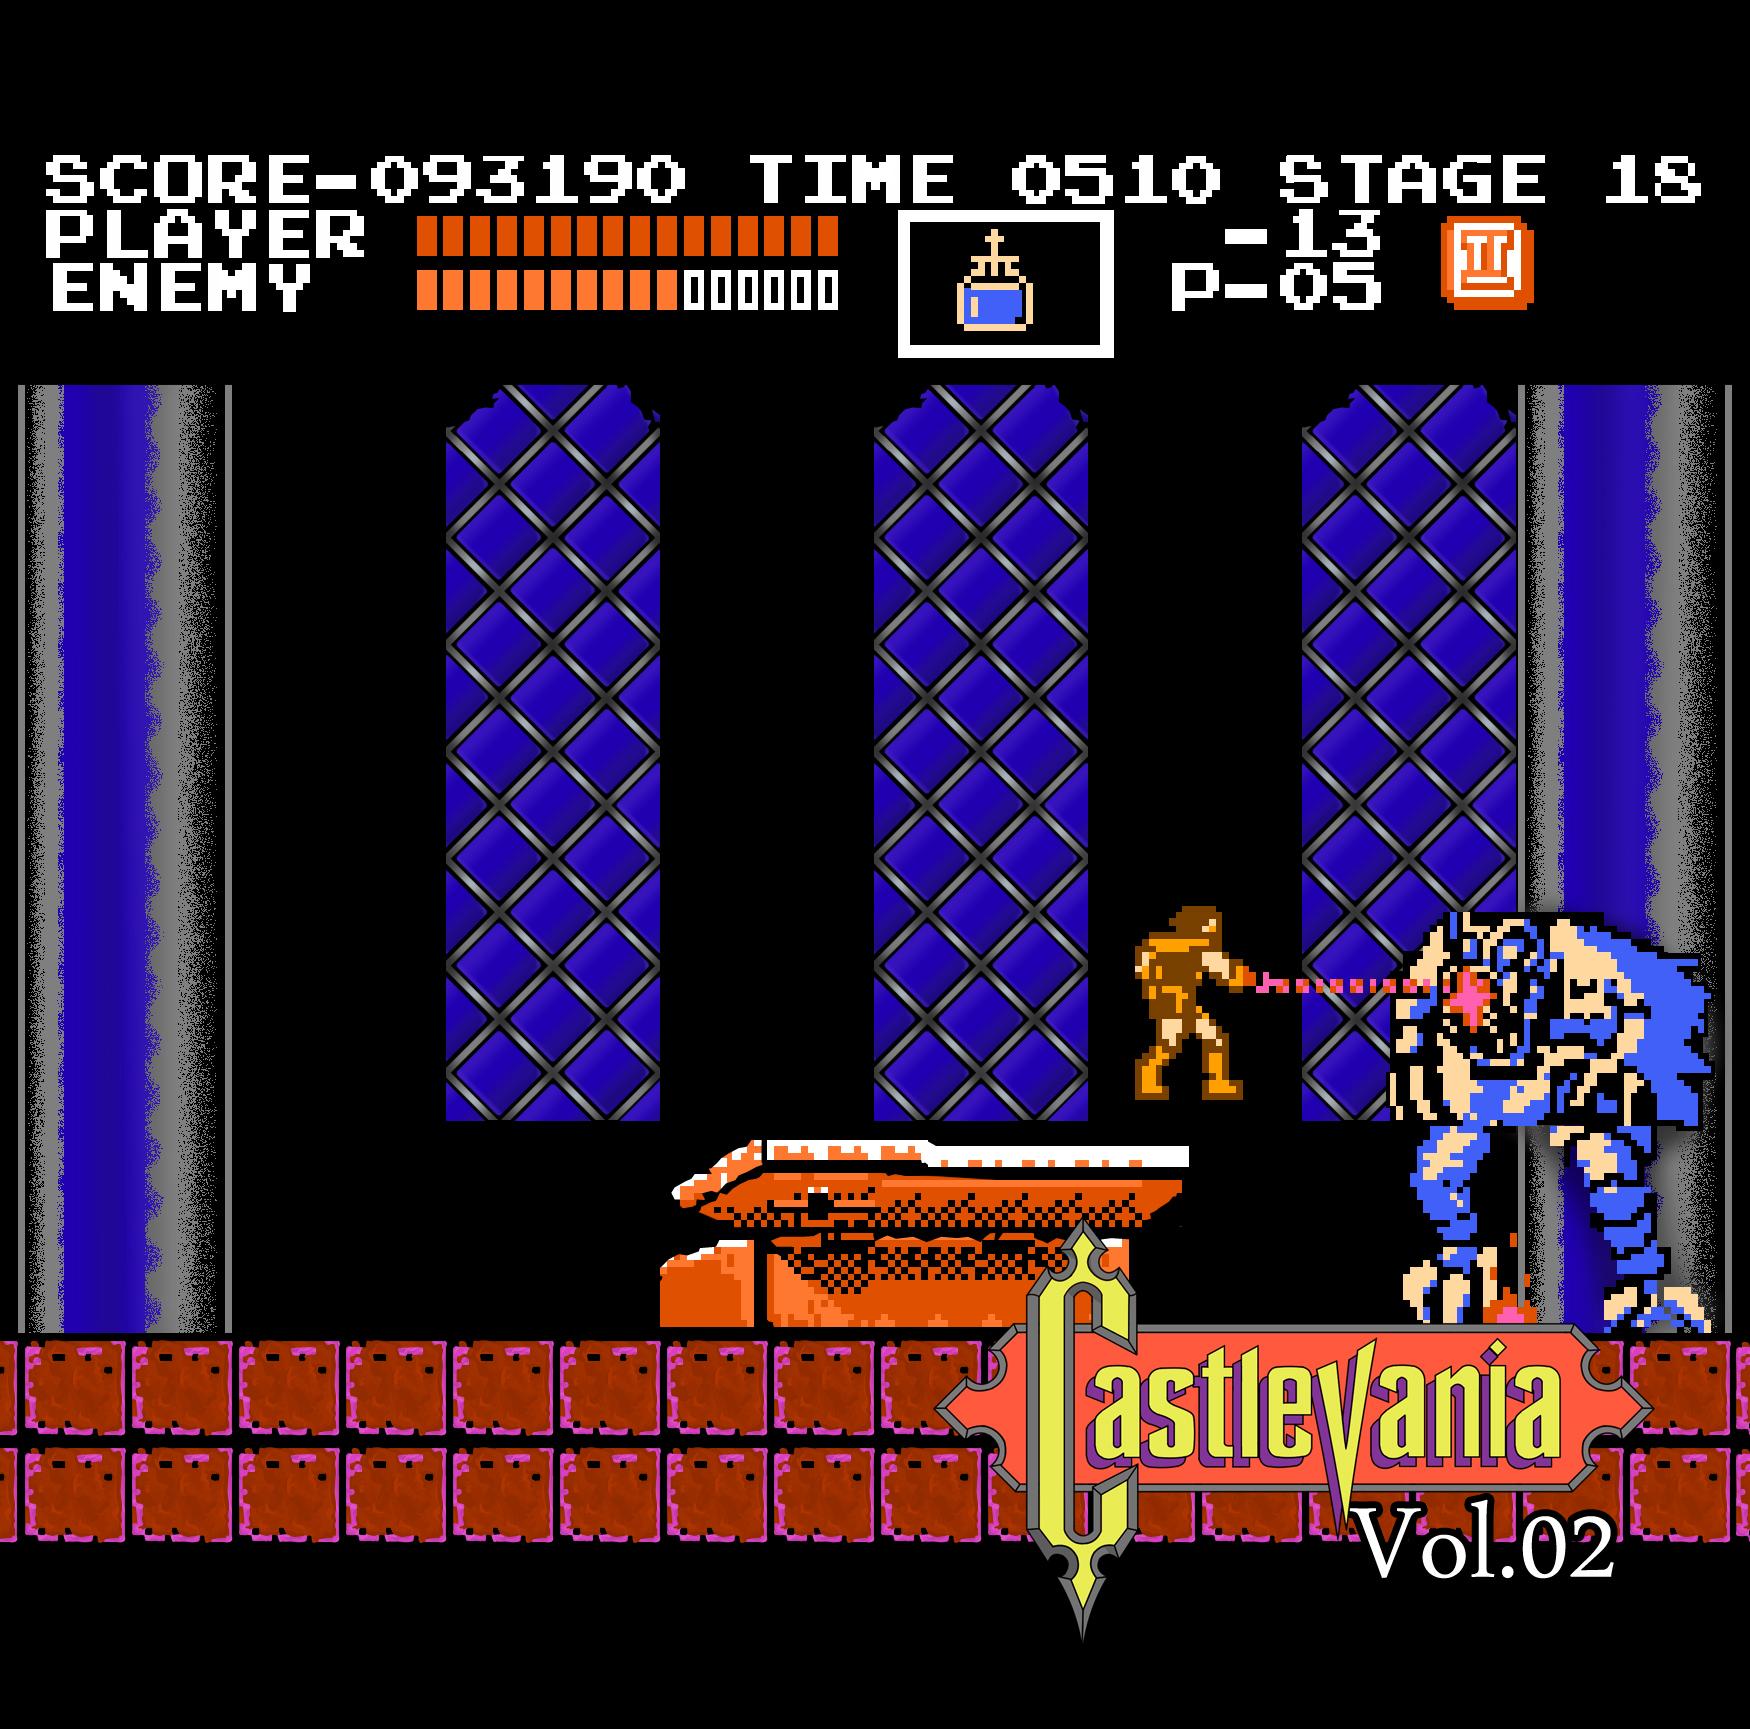 Castle vania Vol02